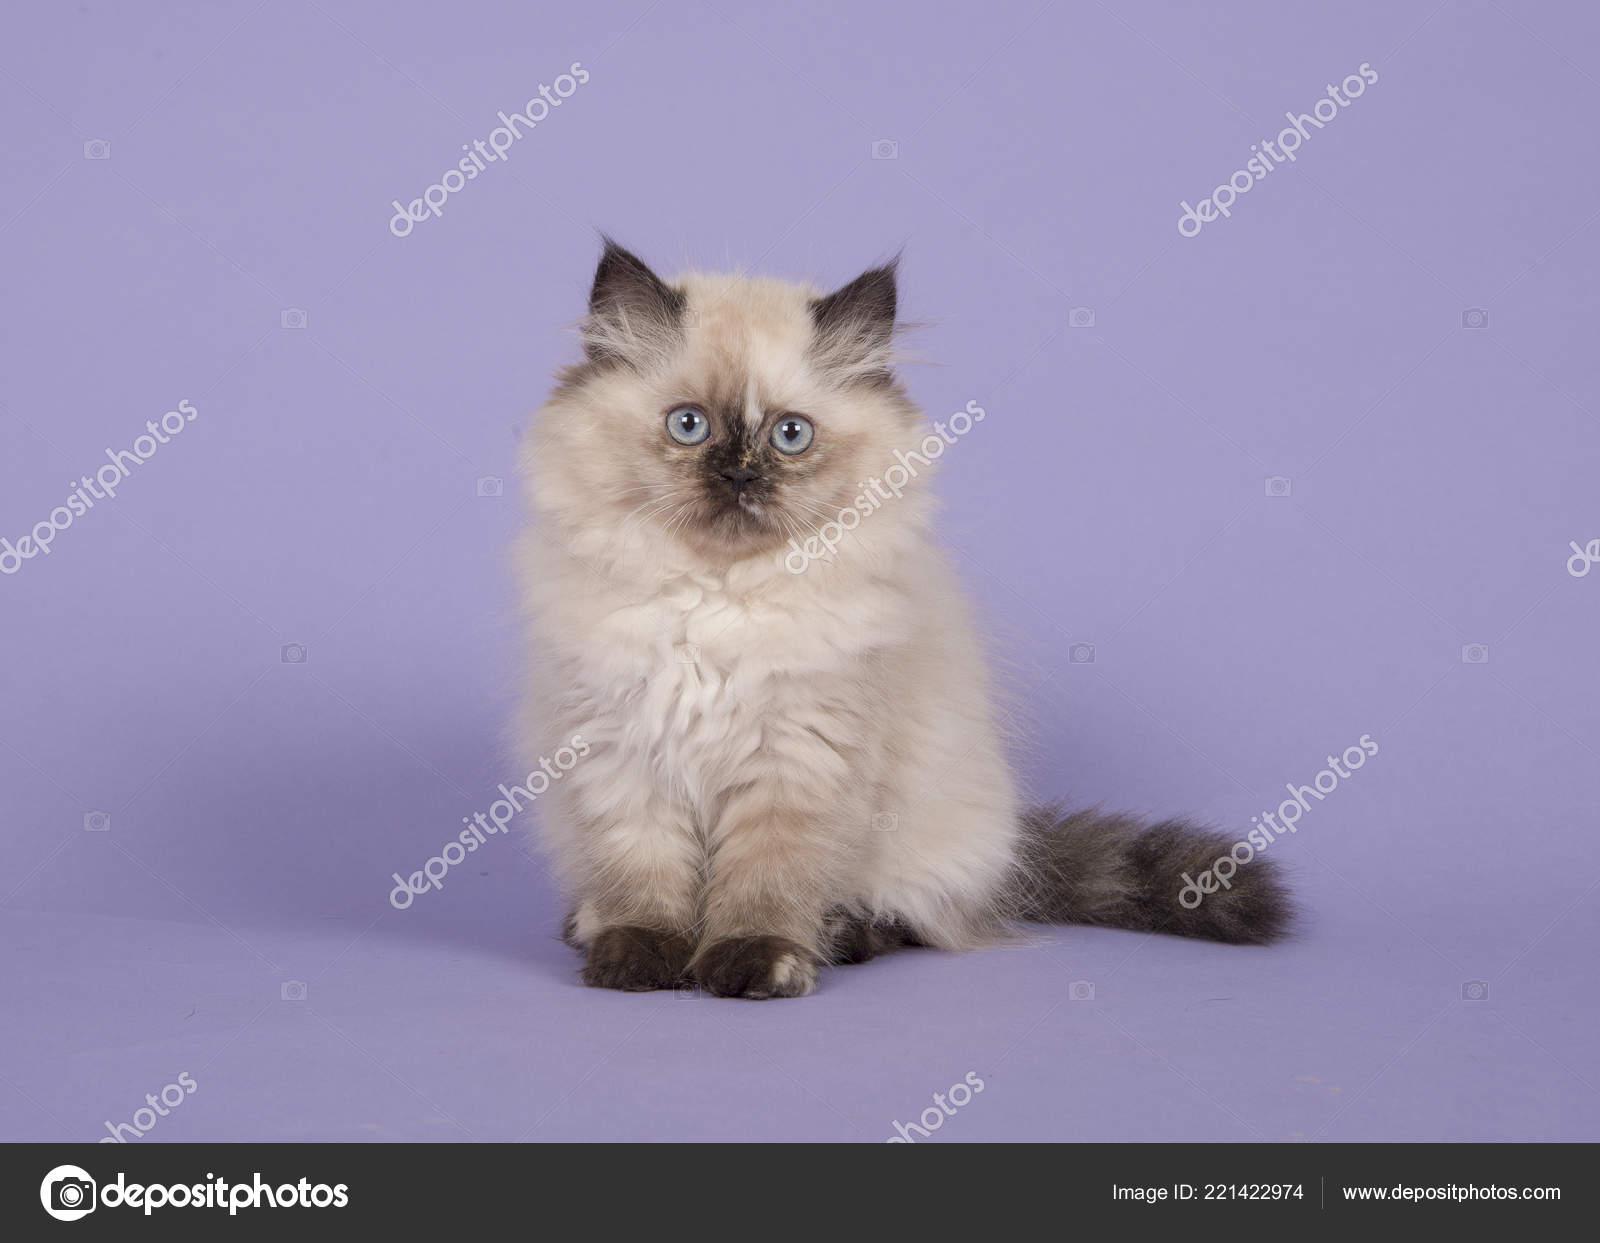 Seal Point Persian Longhair Kitten Blue Eyes Sitting Purple